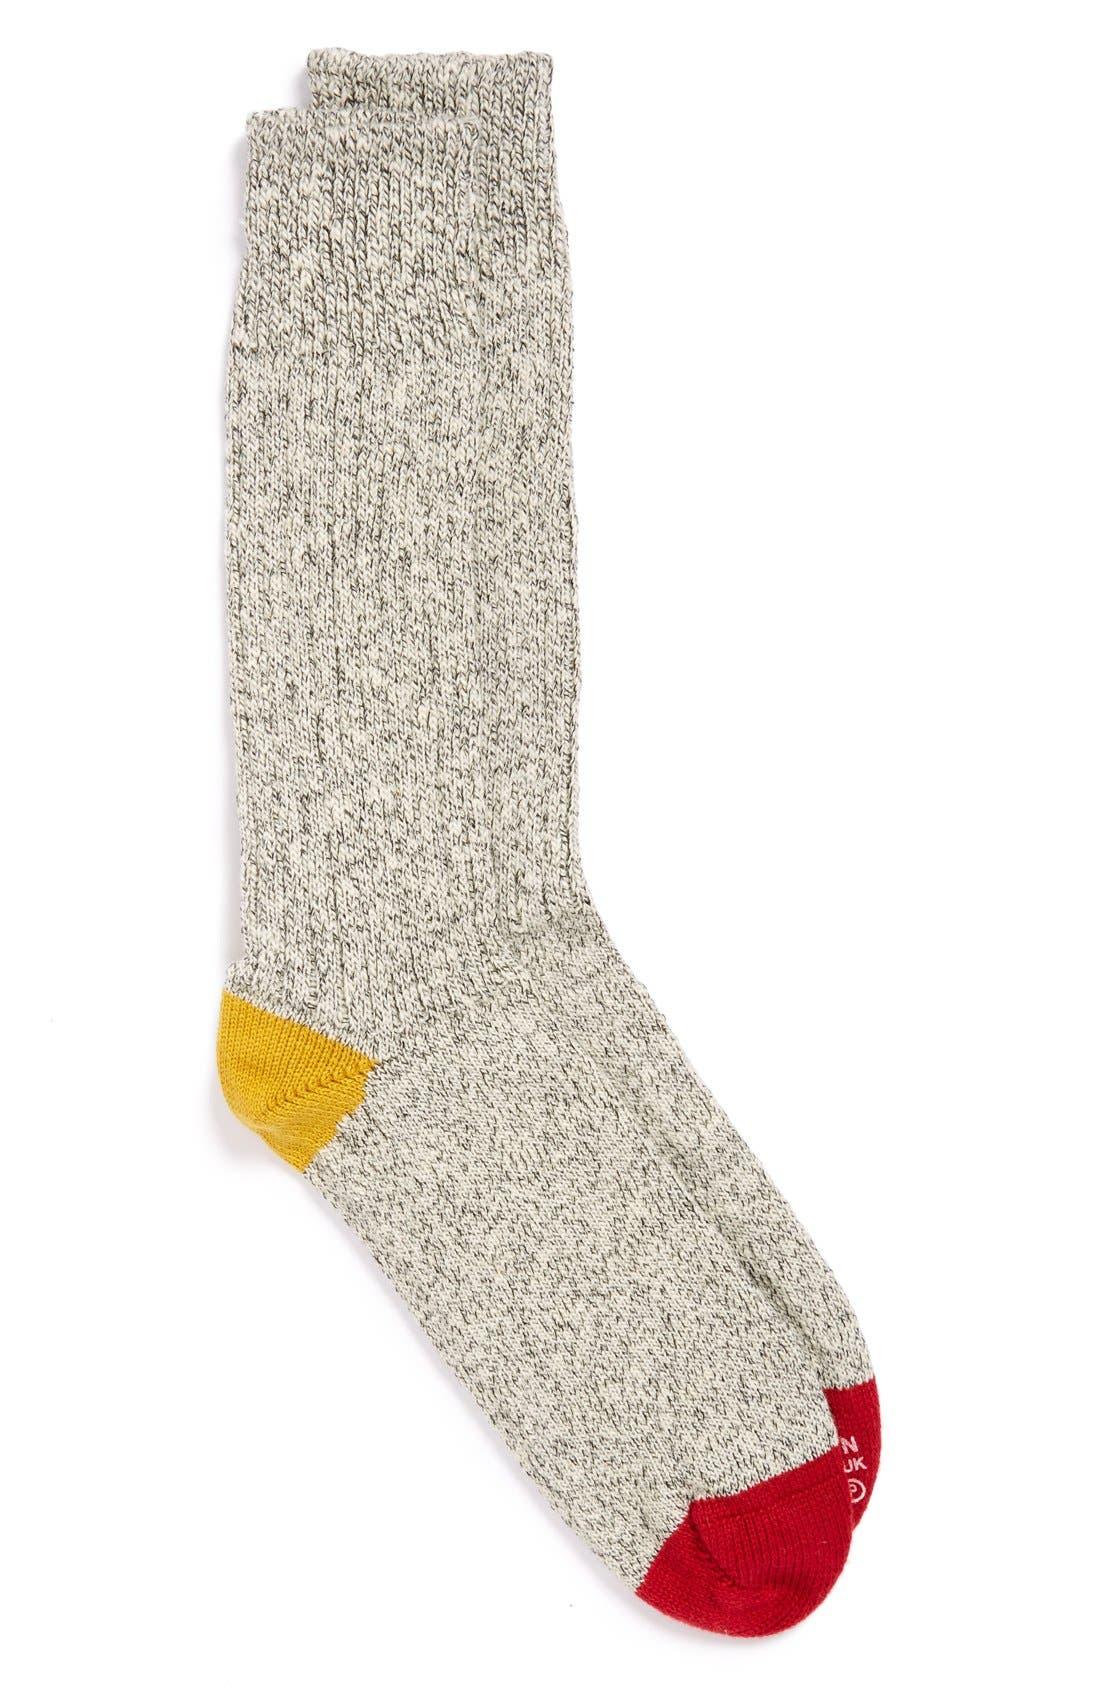 Knit Cotton Socks,                             Main thumbnail 1, color,                             700